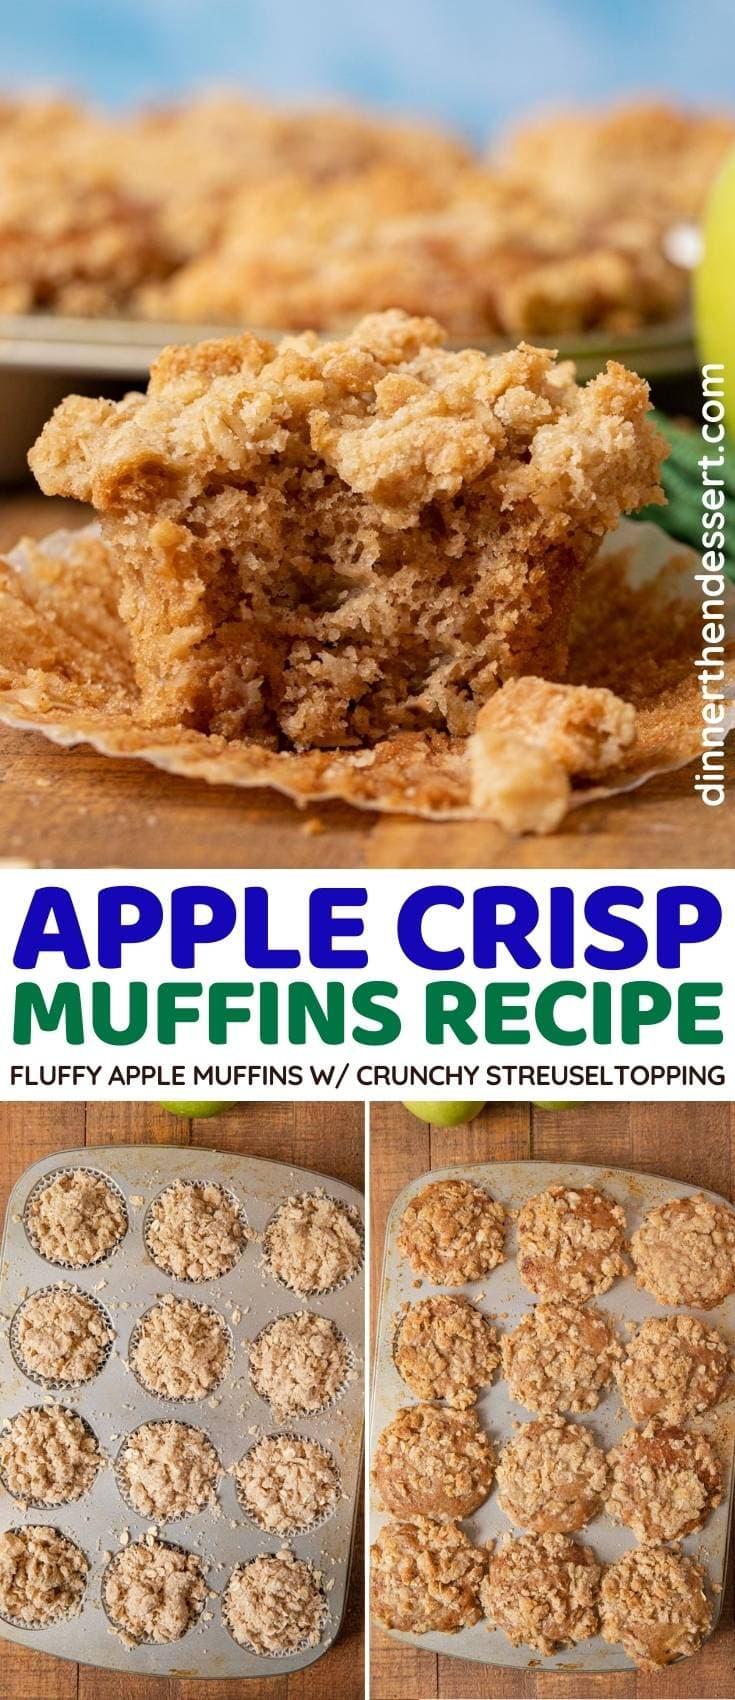 Apple Crisp Muffins collage